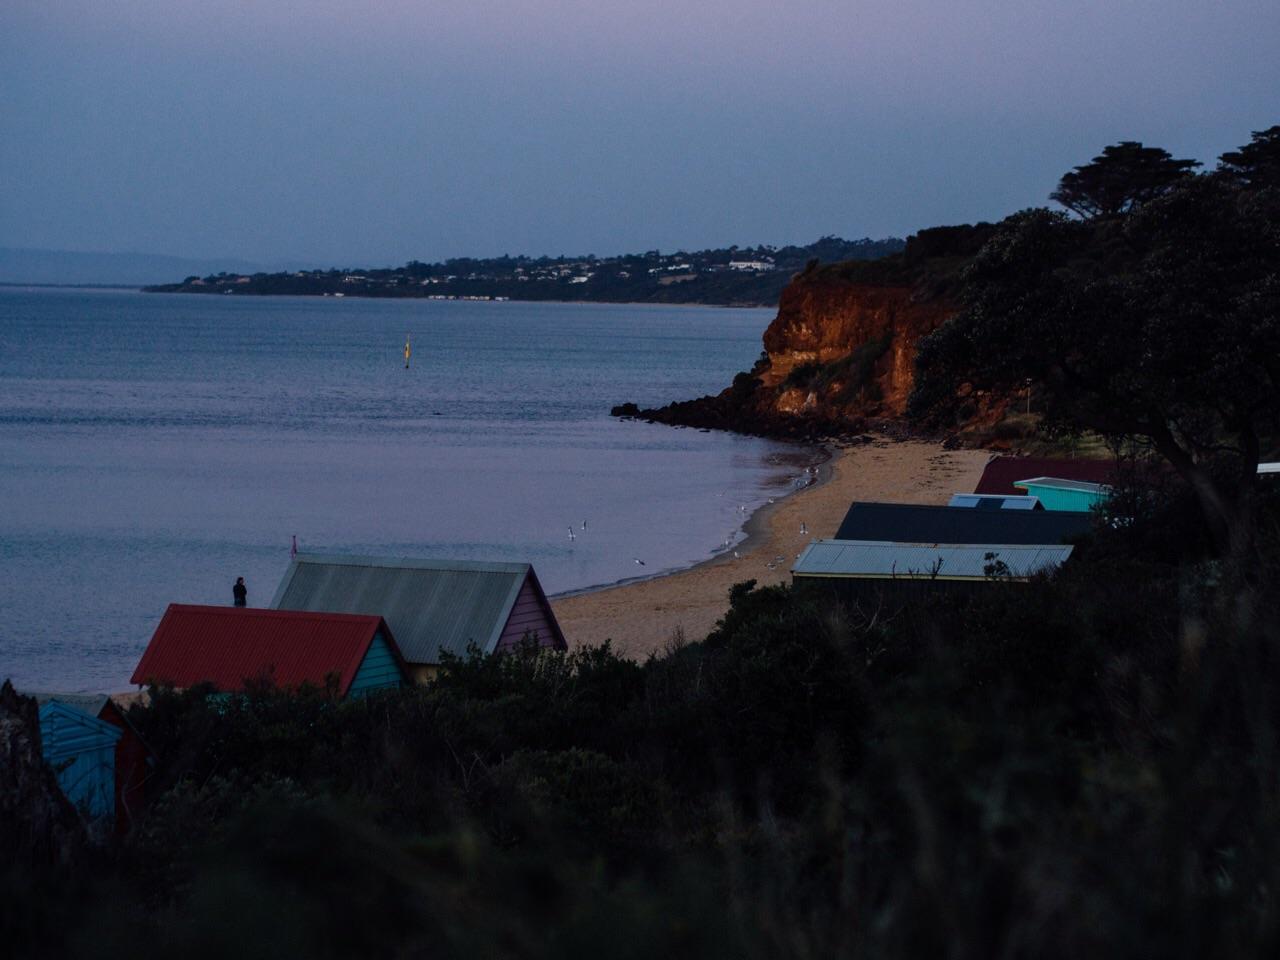 Twilight walk towards the town